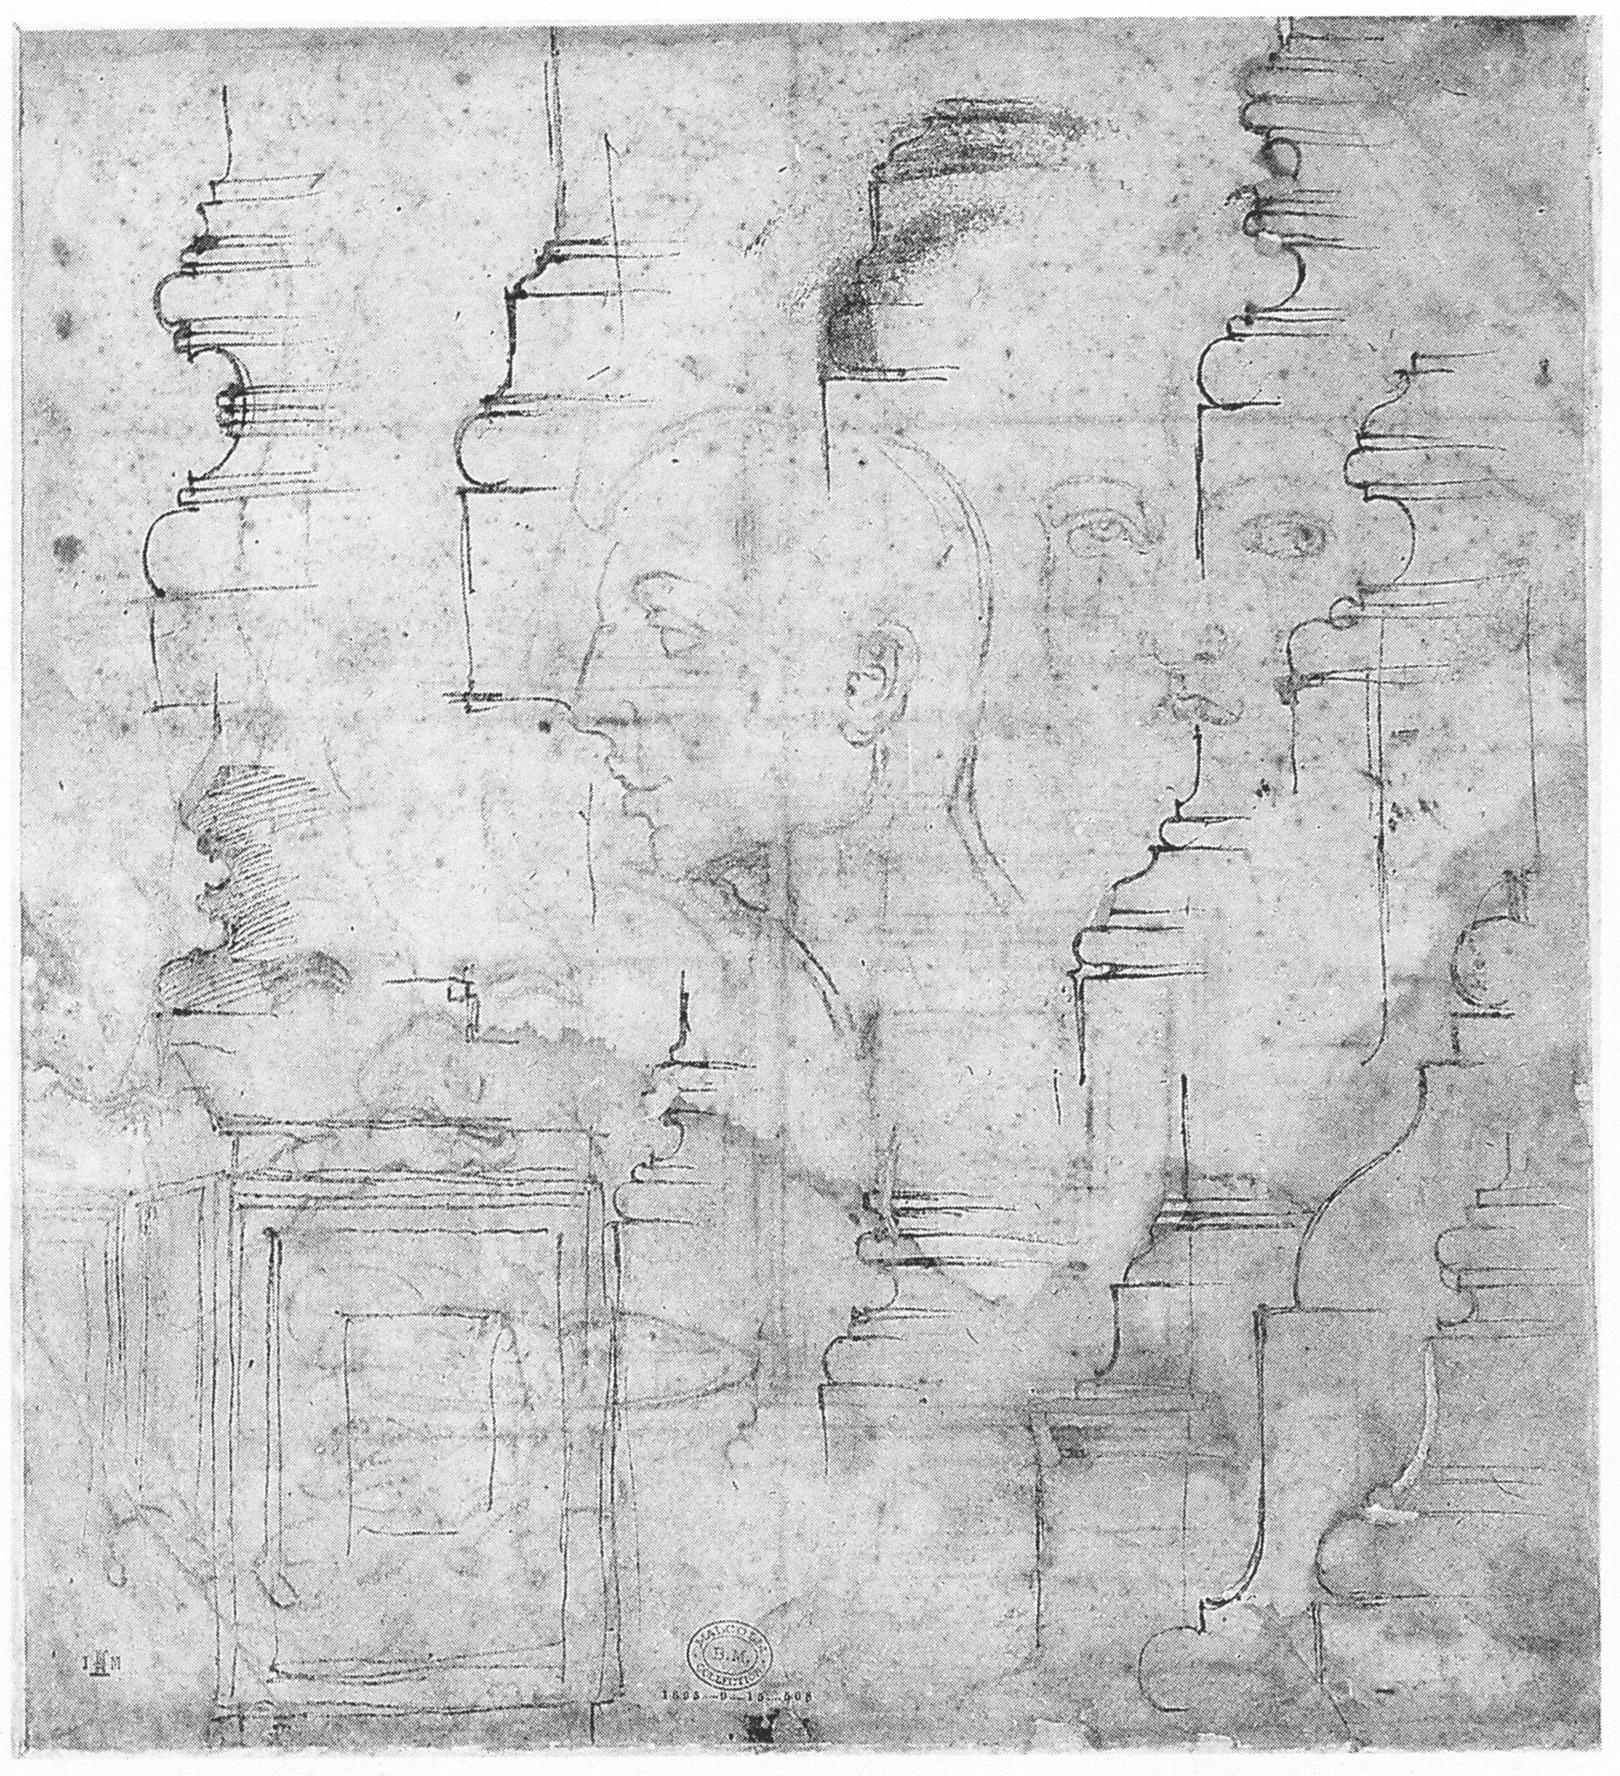 michelangelo anatomy as architecture in williamsburg va